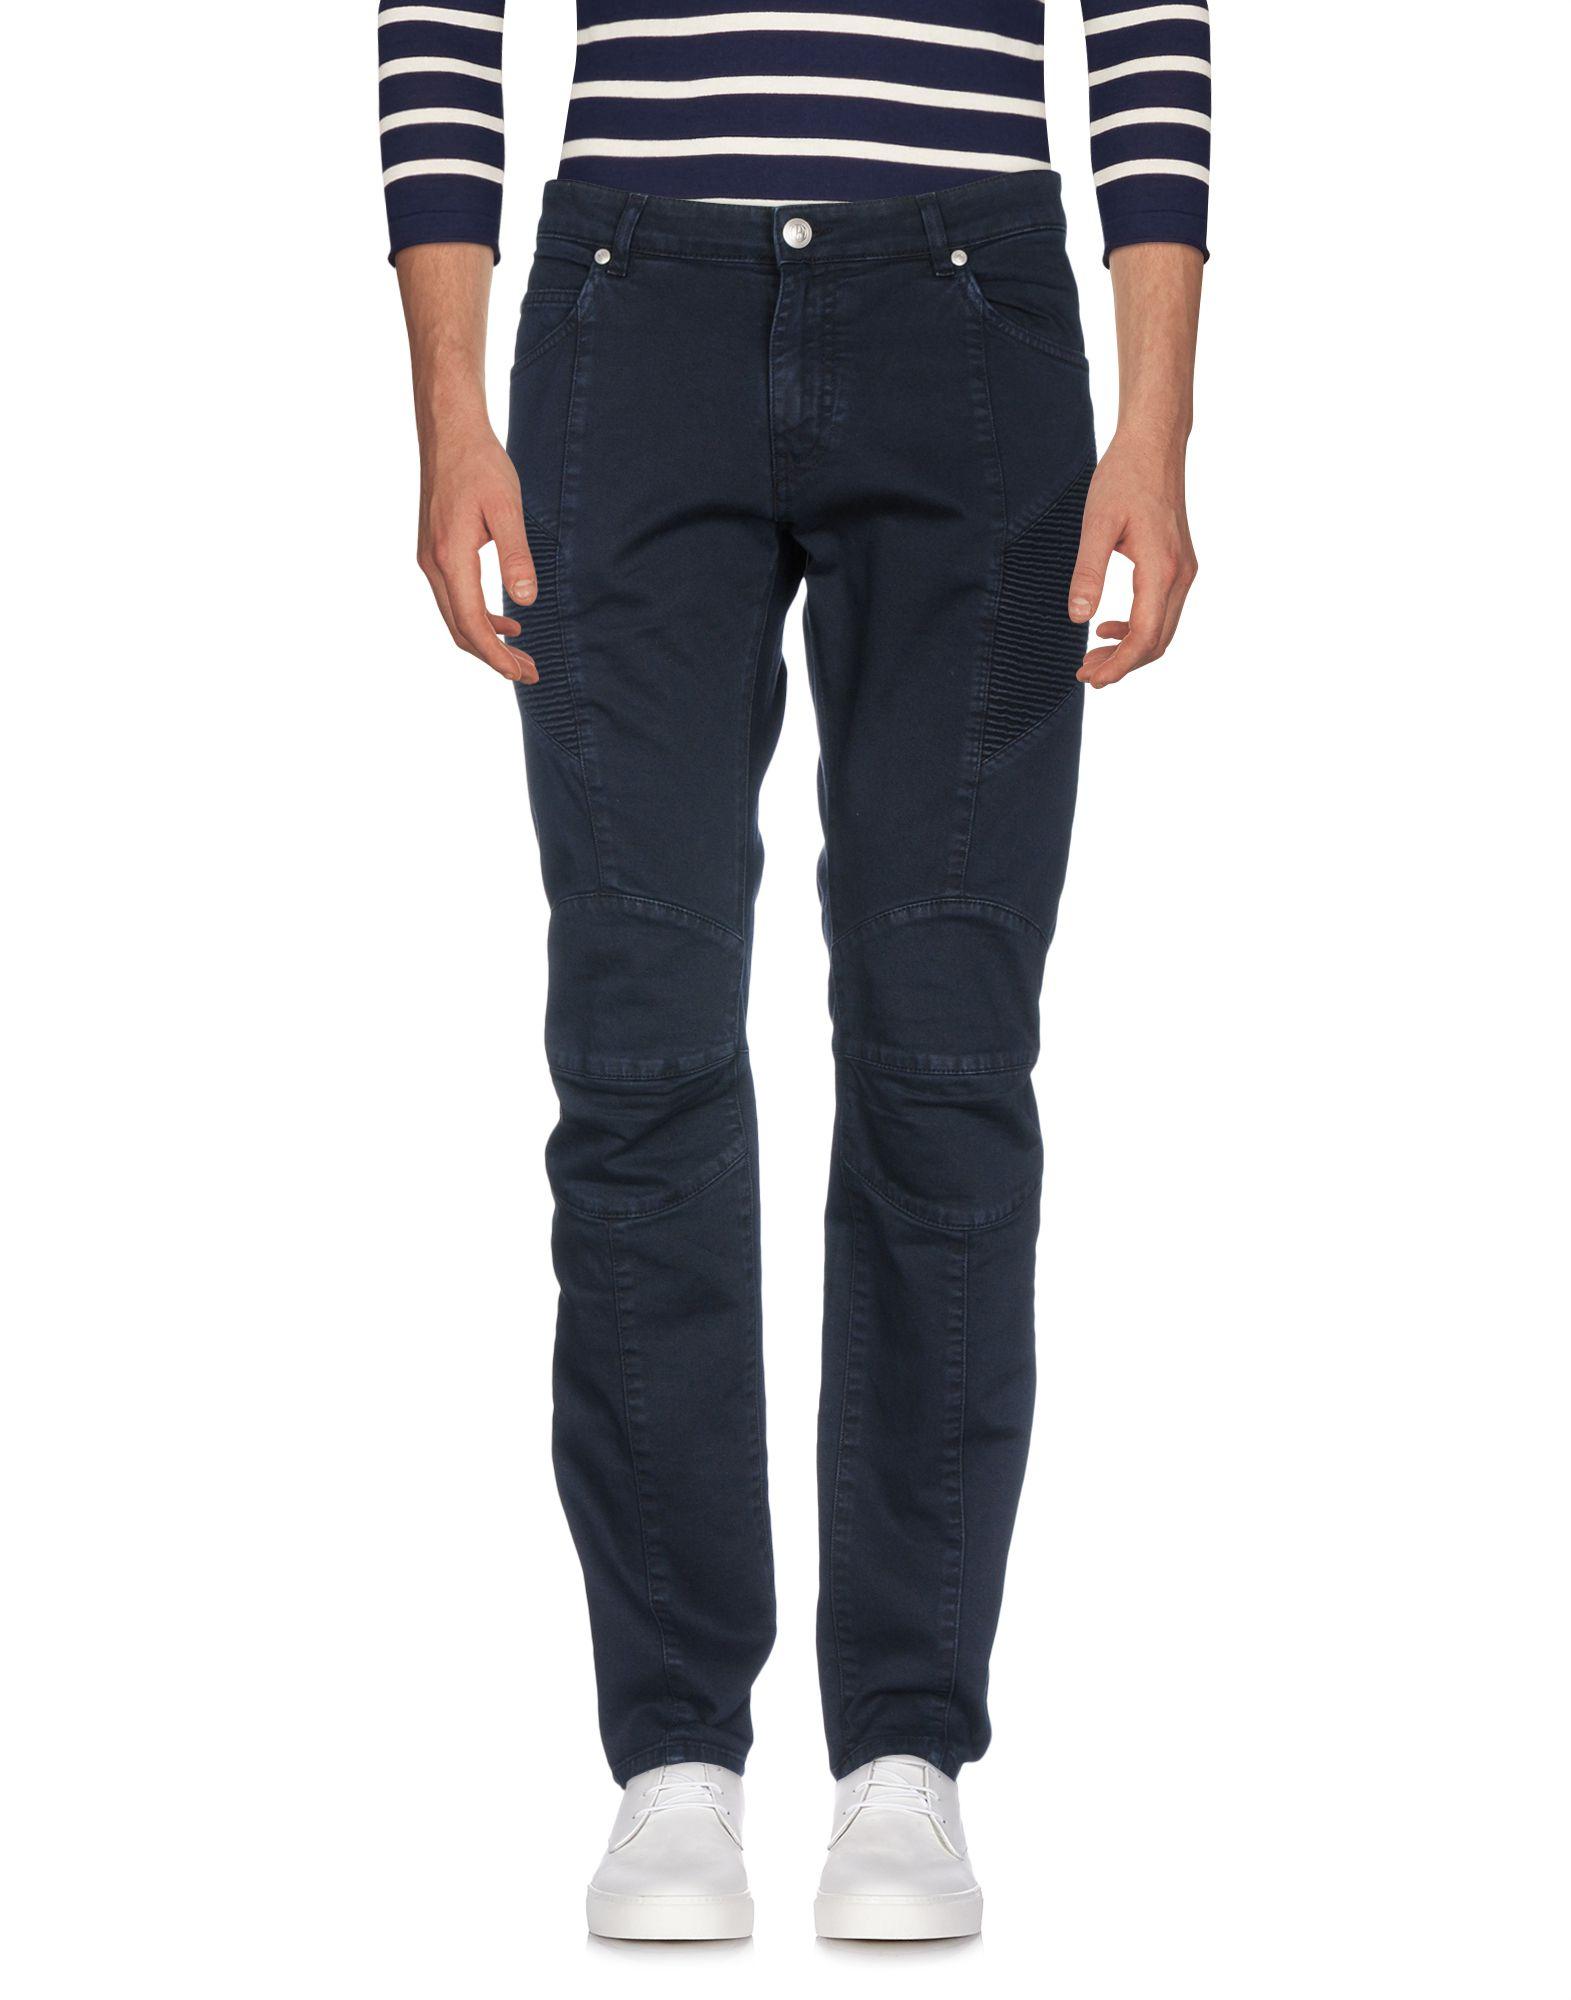 Pantaloni Jeans Pierre Balmain Uomo - Acquista online su